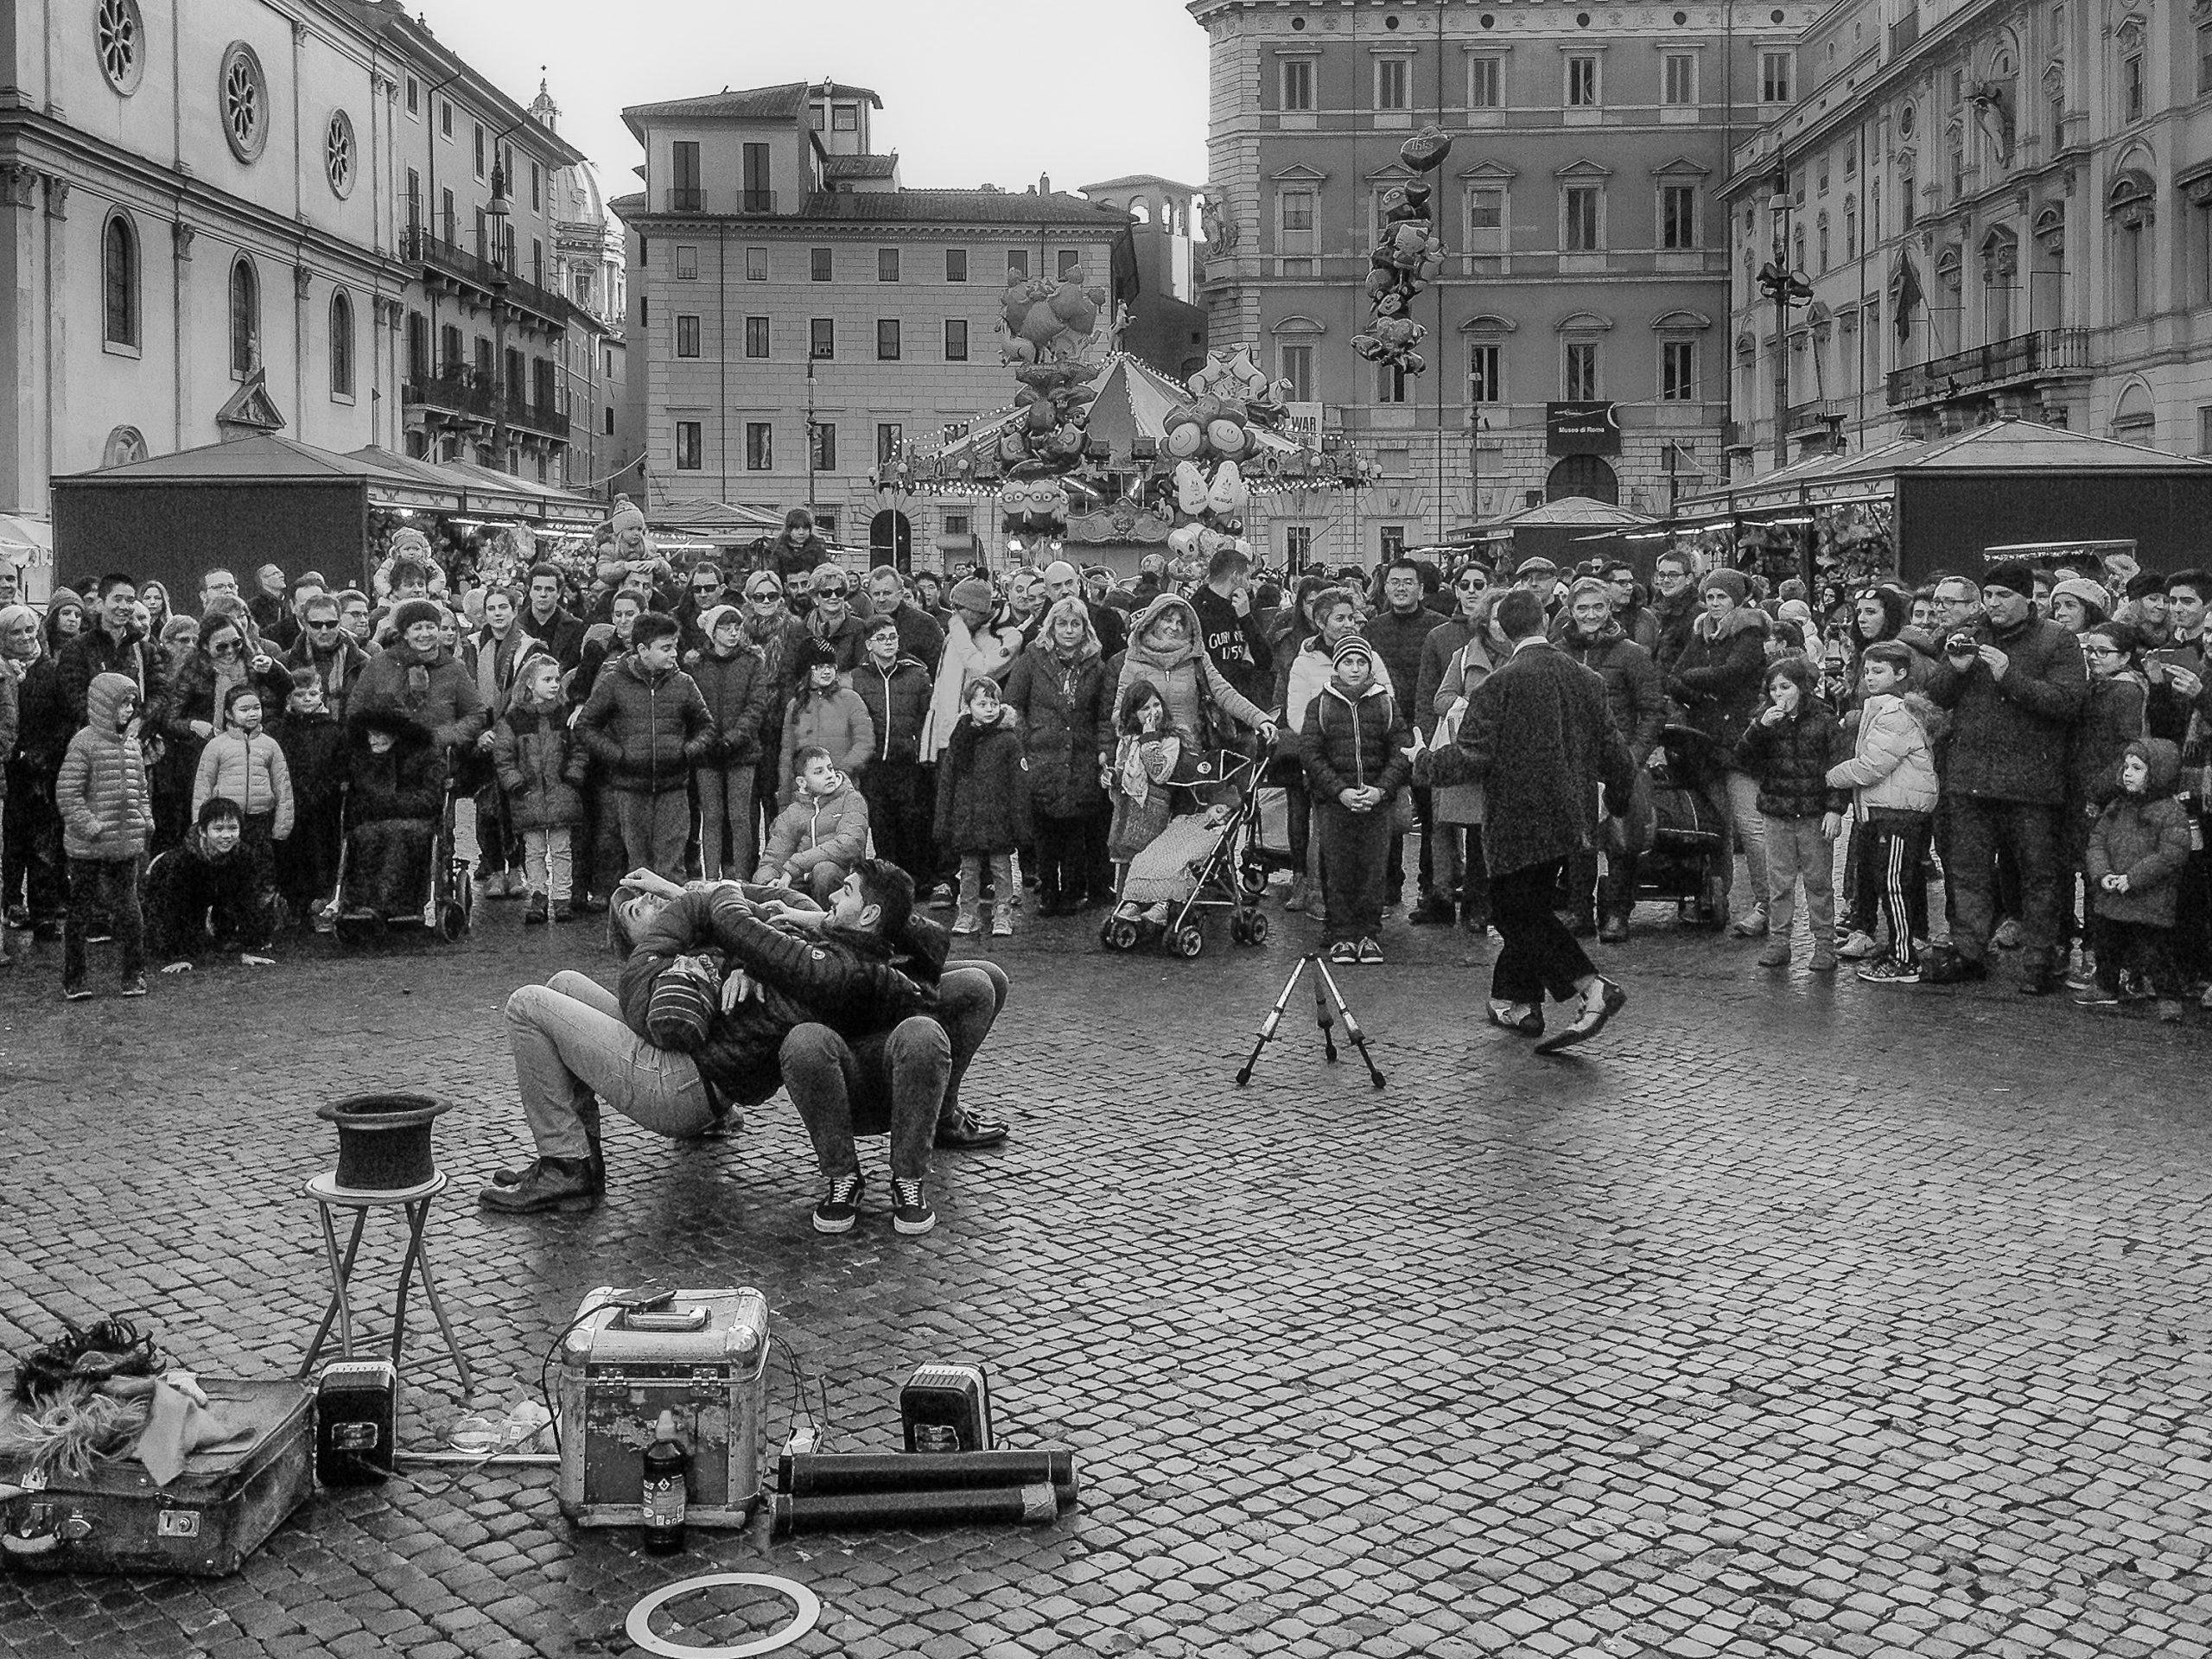 Piazza Navona, 2015